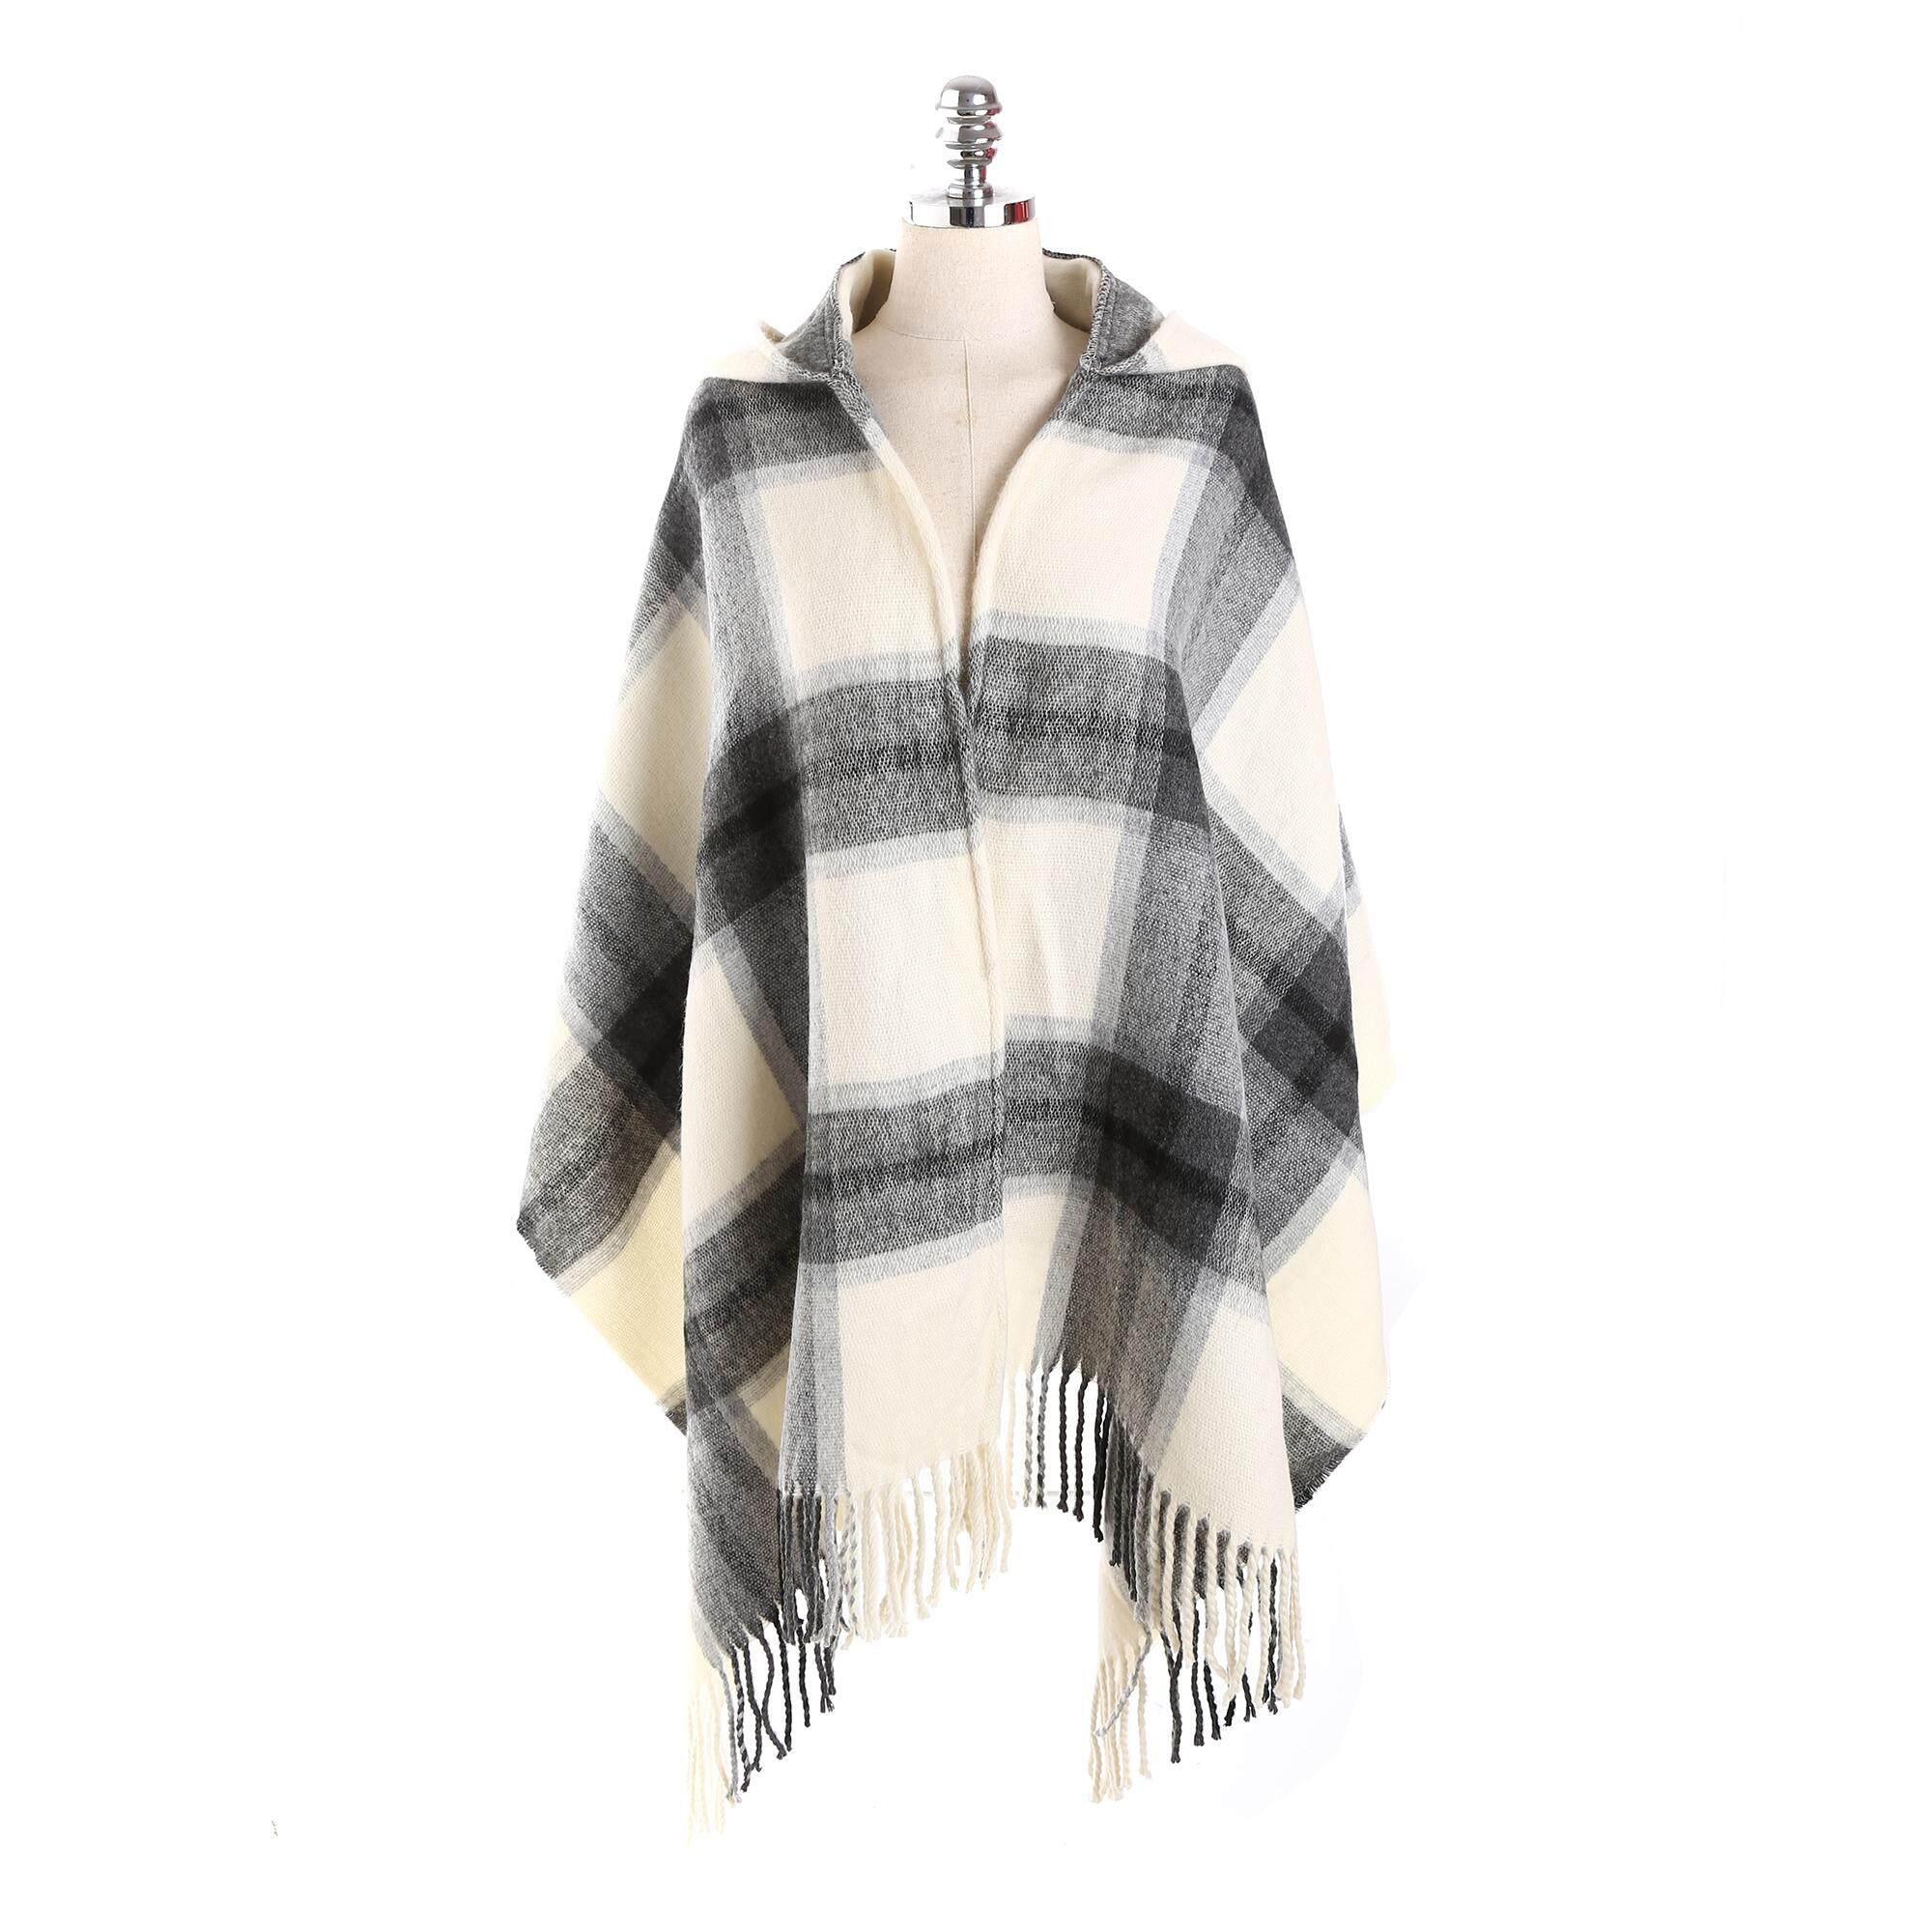 ed422bd82a5c Women Winter Warm Tartan Cashmere Scarf New Designer Plaid Hood Hat Scarf  Shawls Scarves Wraps